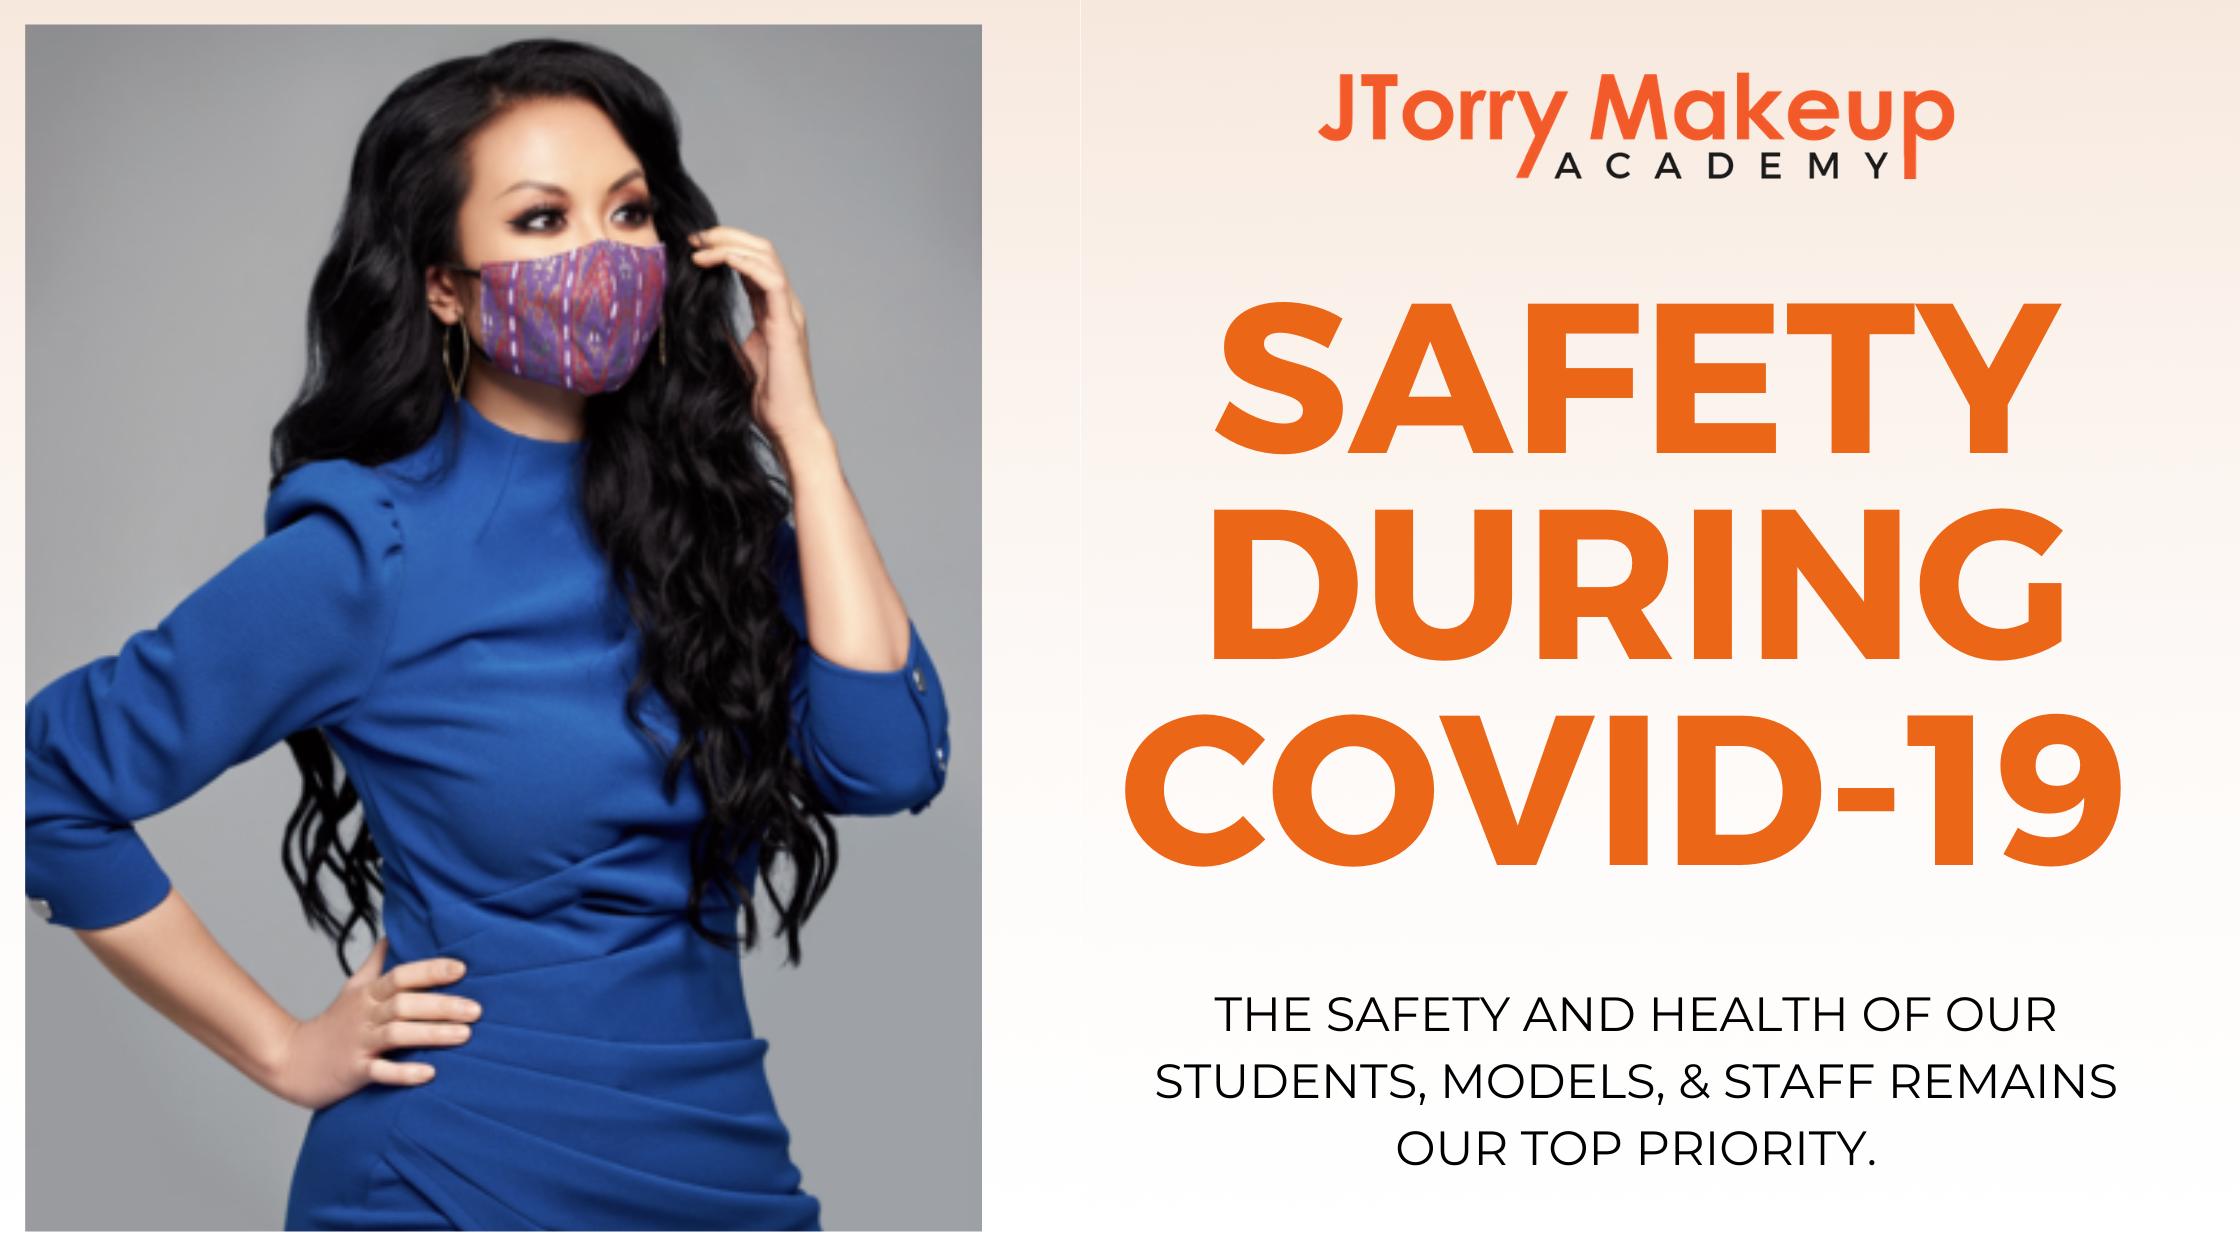 Jenny with face mask